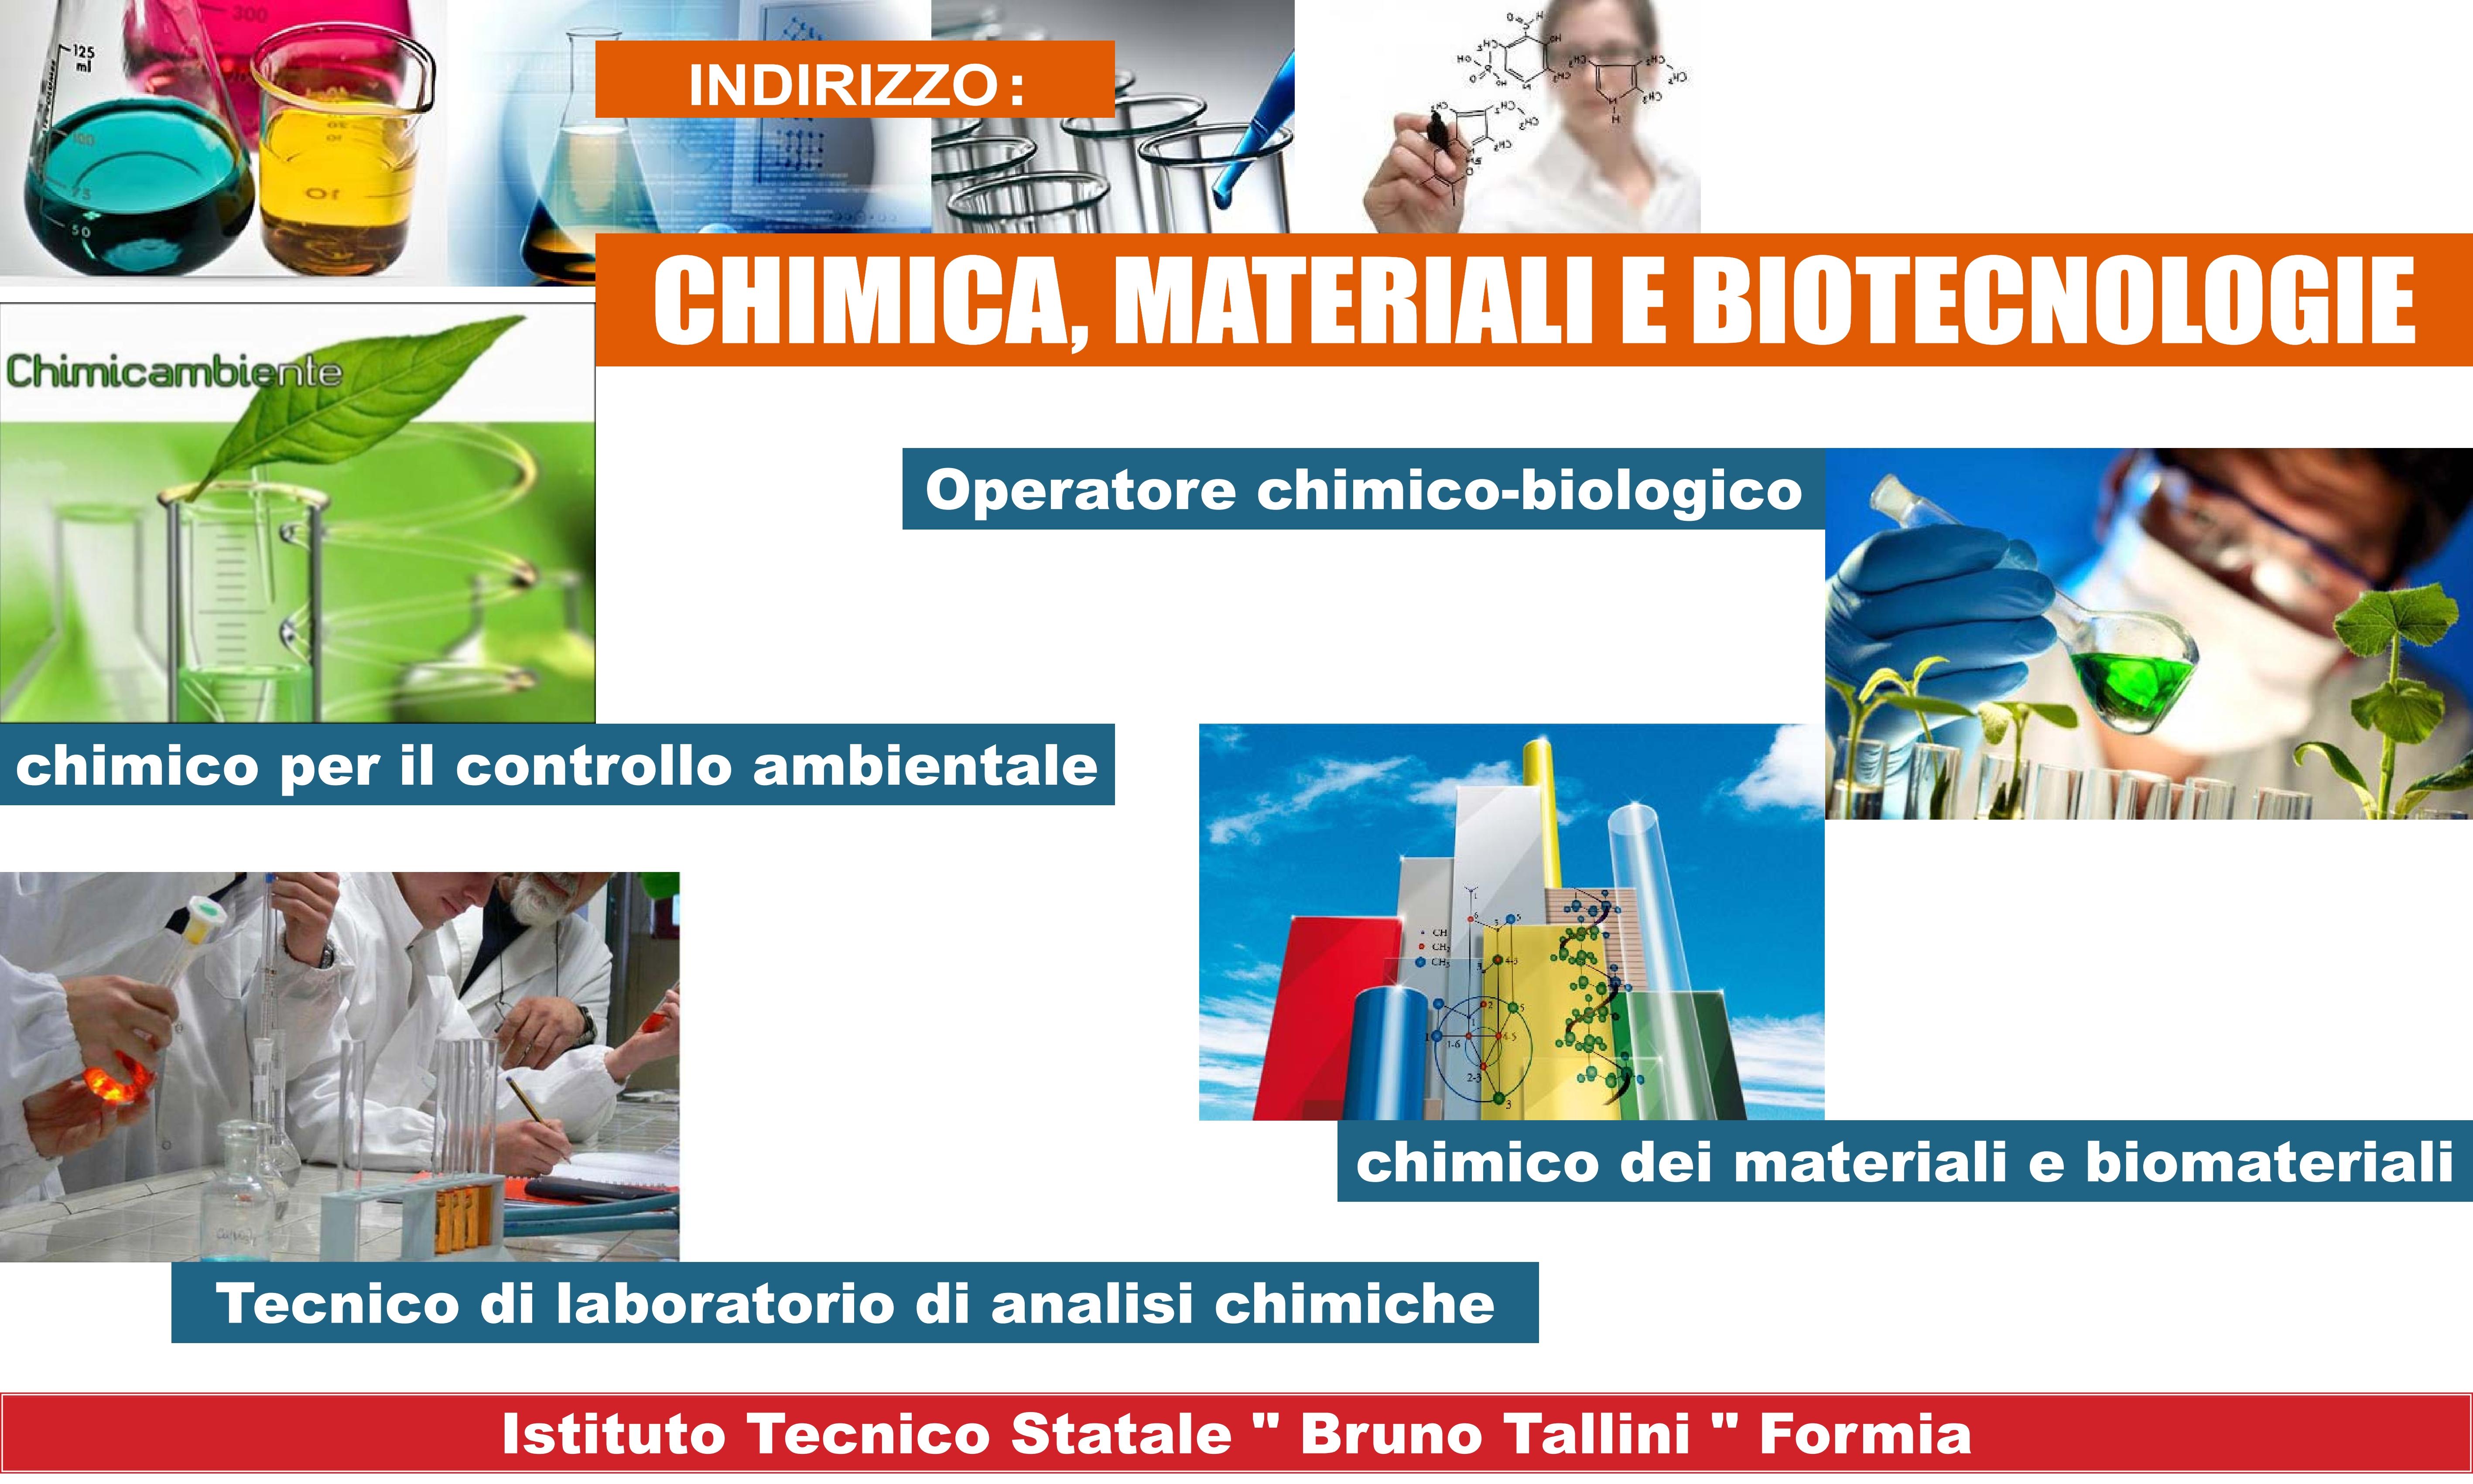 Locandina Chimica,Materiali e Biotecnologie - articolazione chimica ambientale